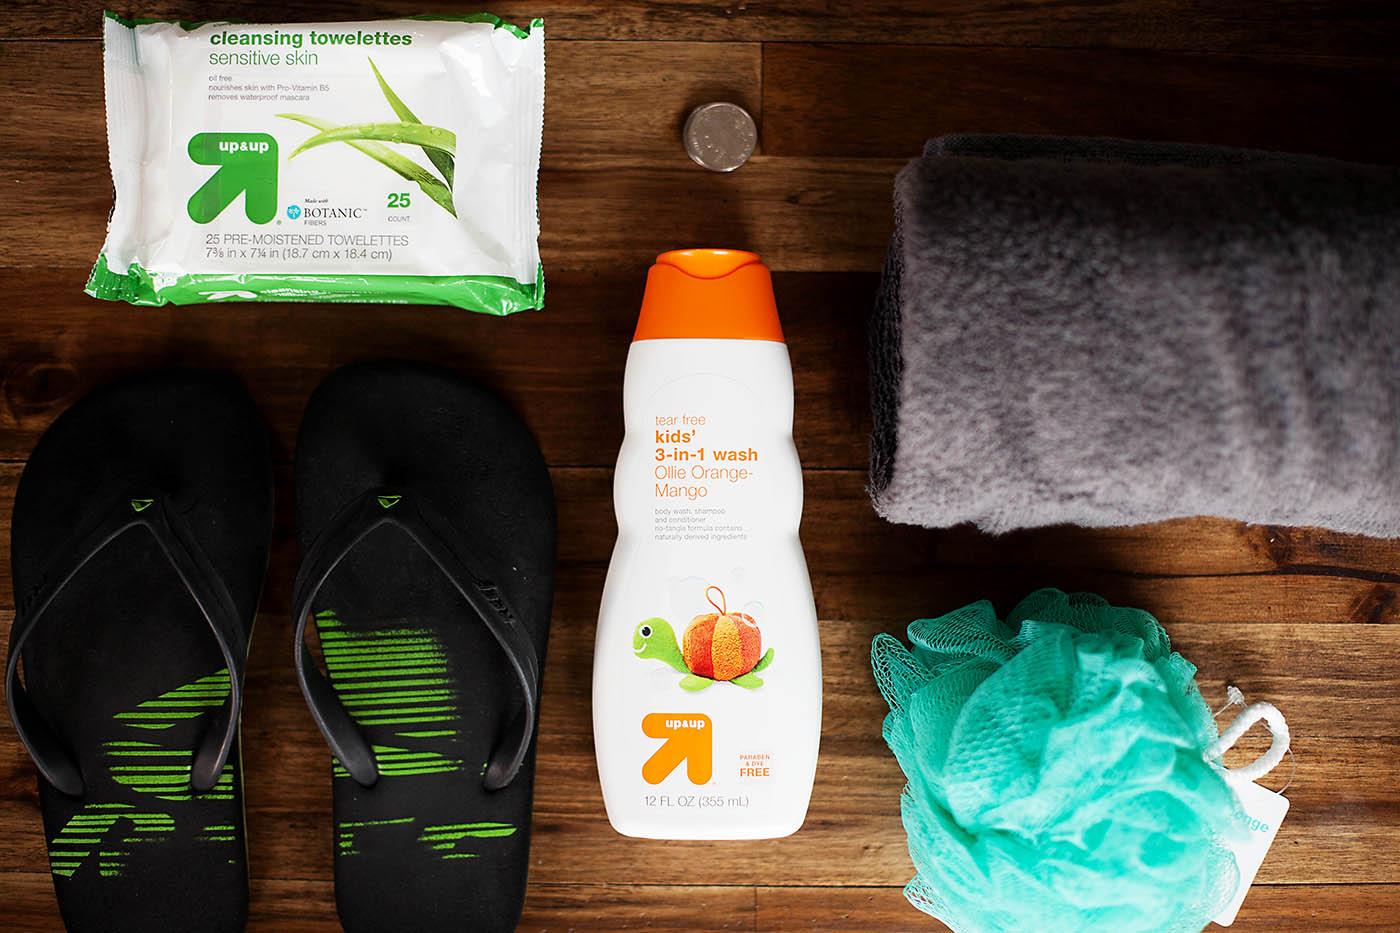 Camping shower tips for kids with Target Up & Up at allfortheboys.com